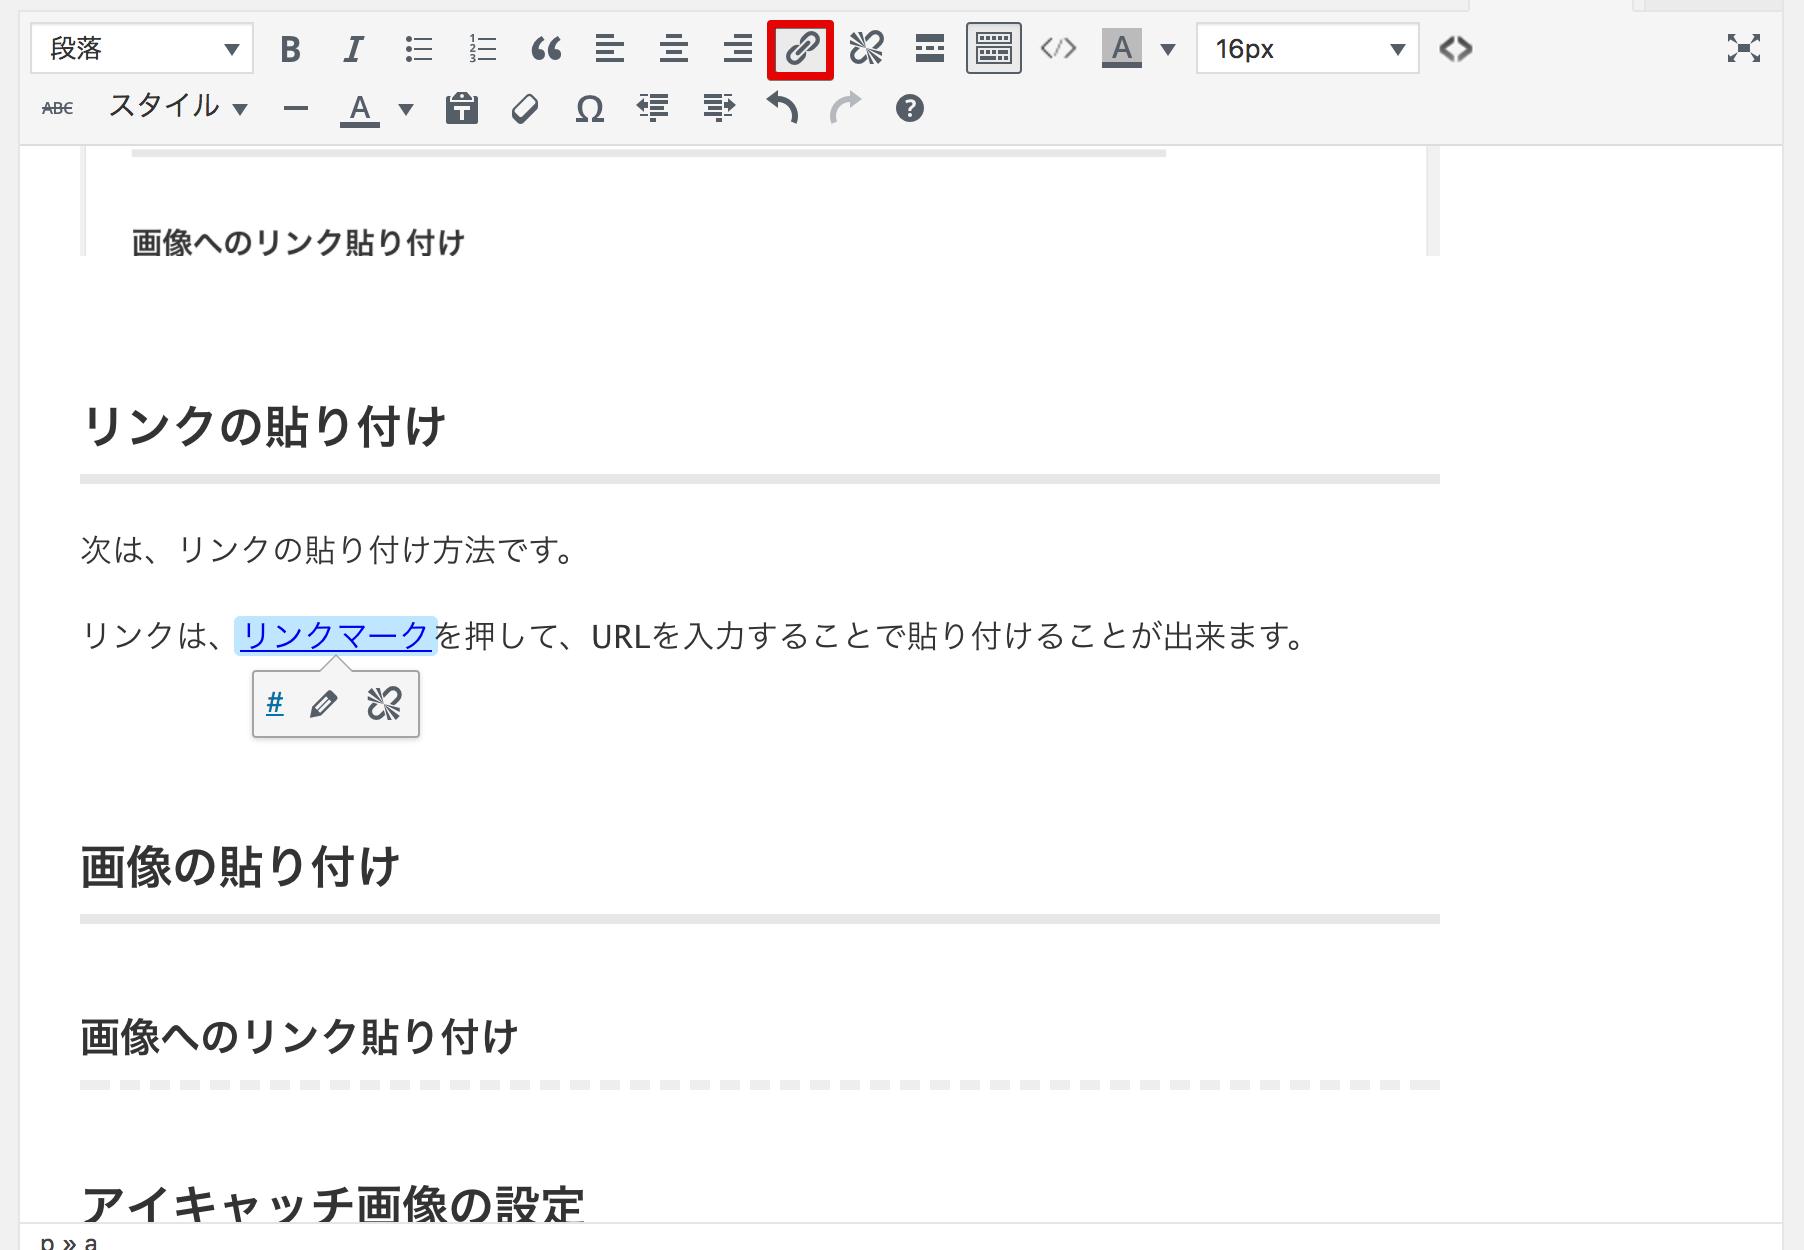 4e3c49588792c85850489ea5a01ae838 - 初心者向け!WordPressの投稿方法や記事の編集方法を徹底解説